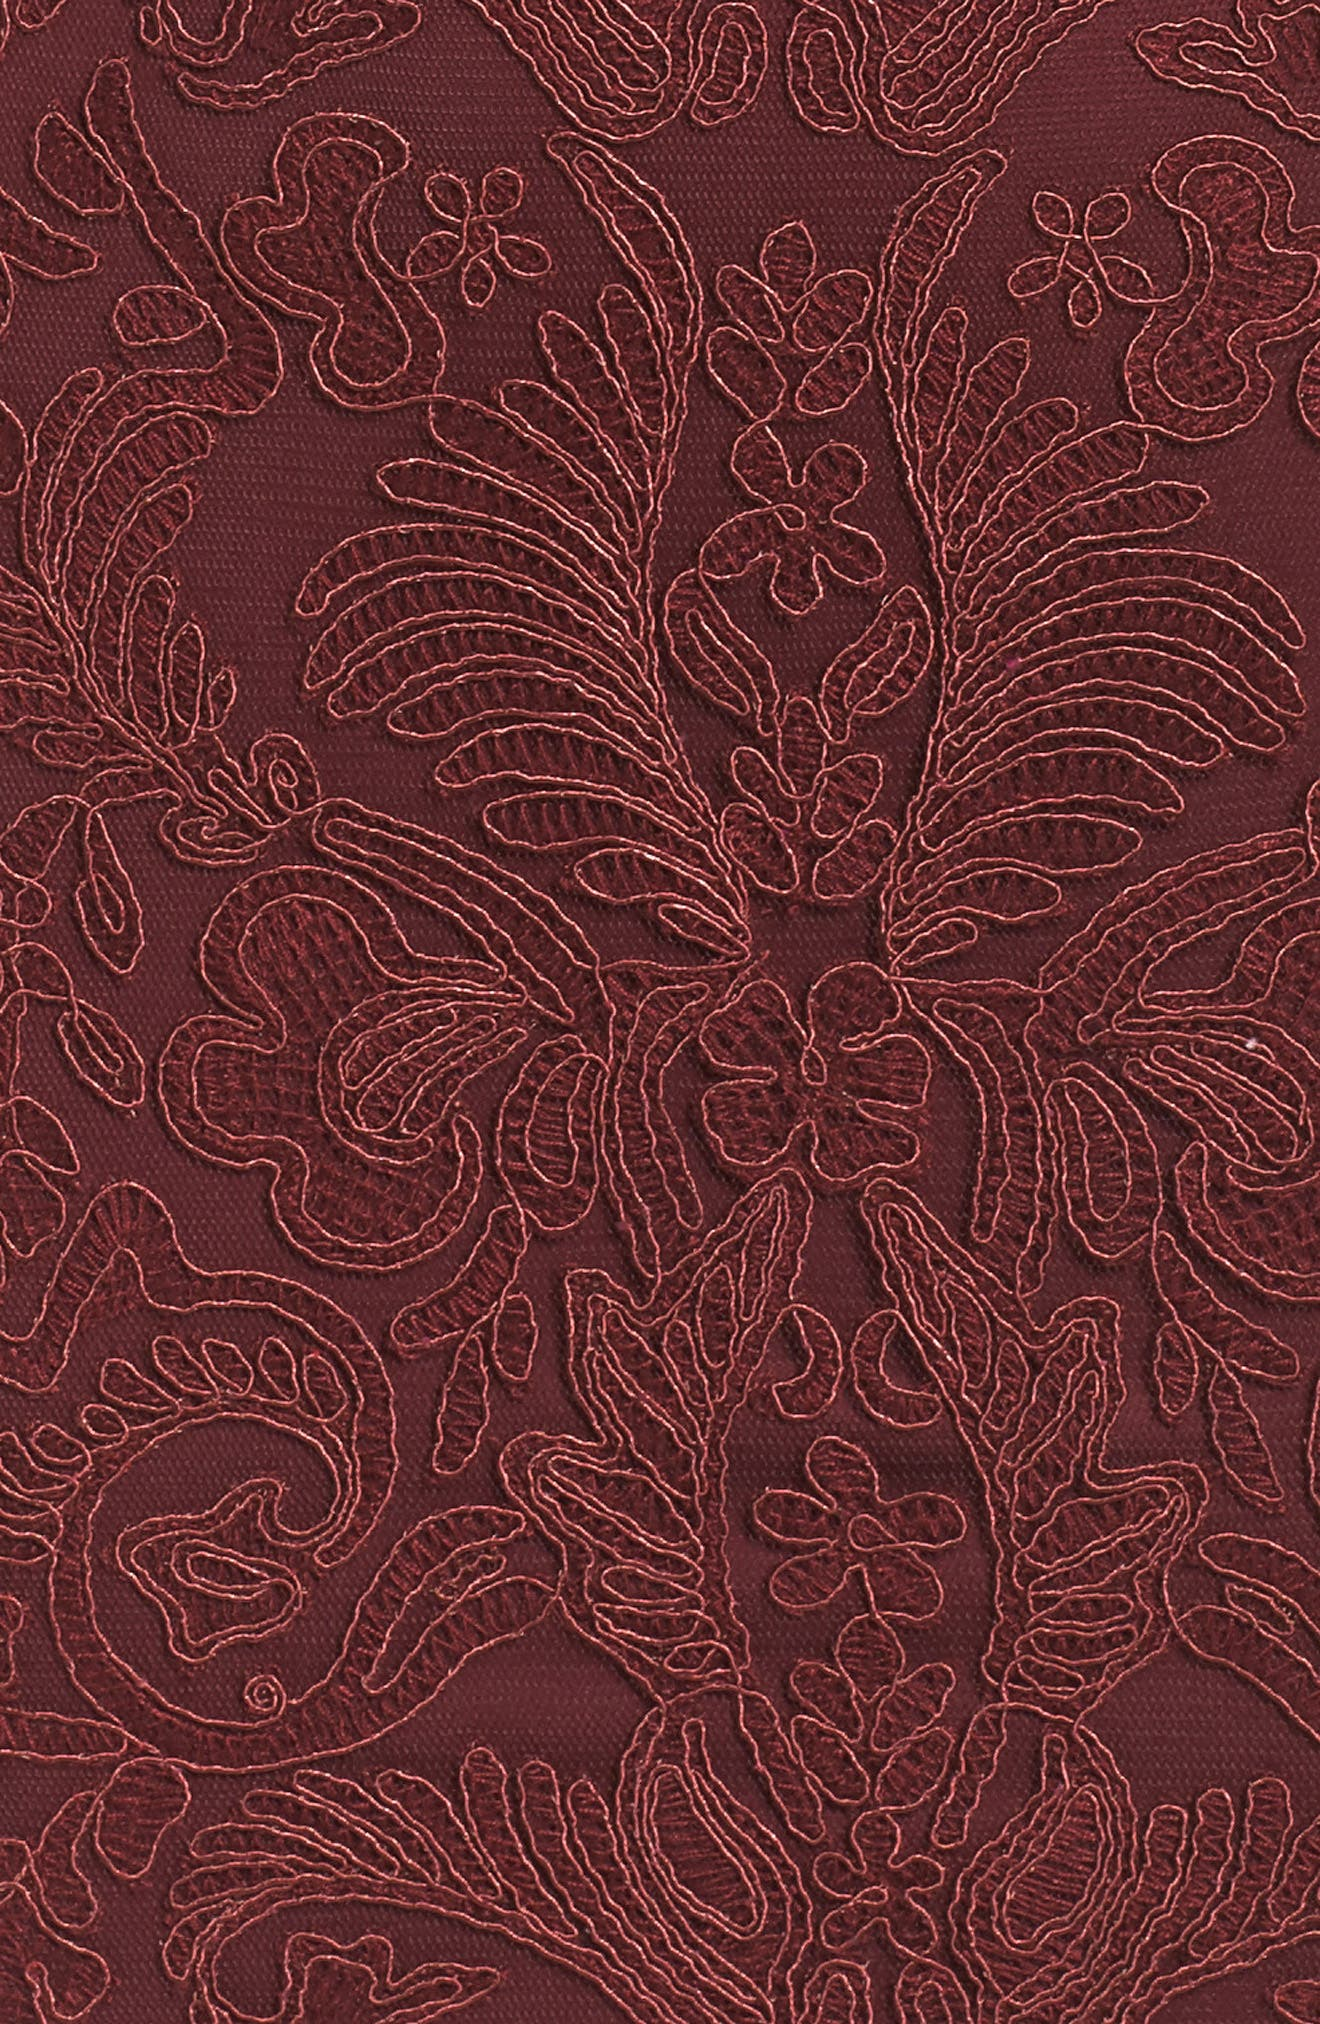 Mock Neck Corded Tulle Sheath Dress,                             Alternate thumbnail 5, color,                             Auburn